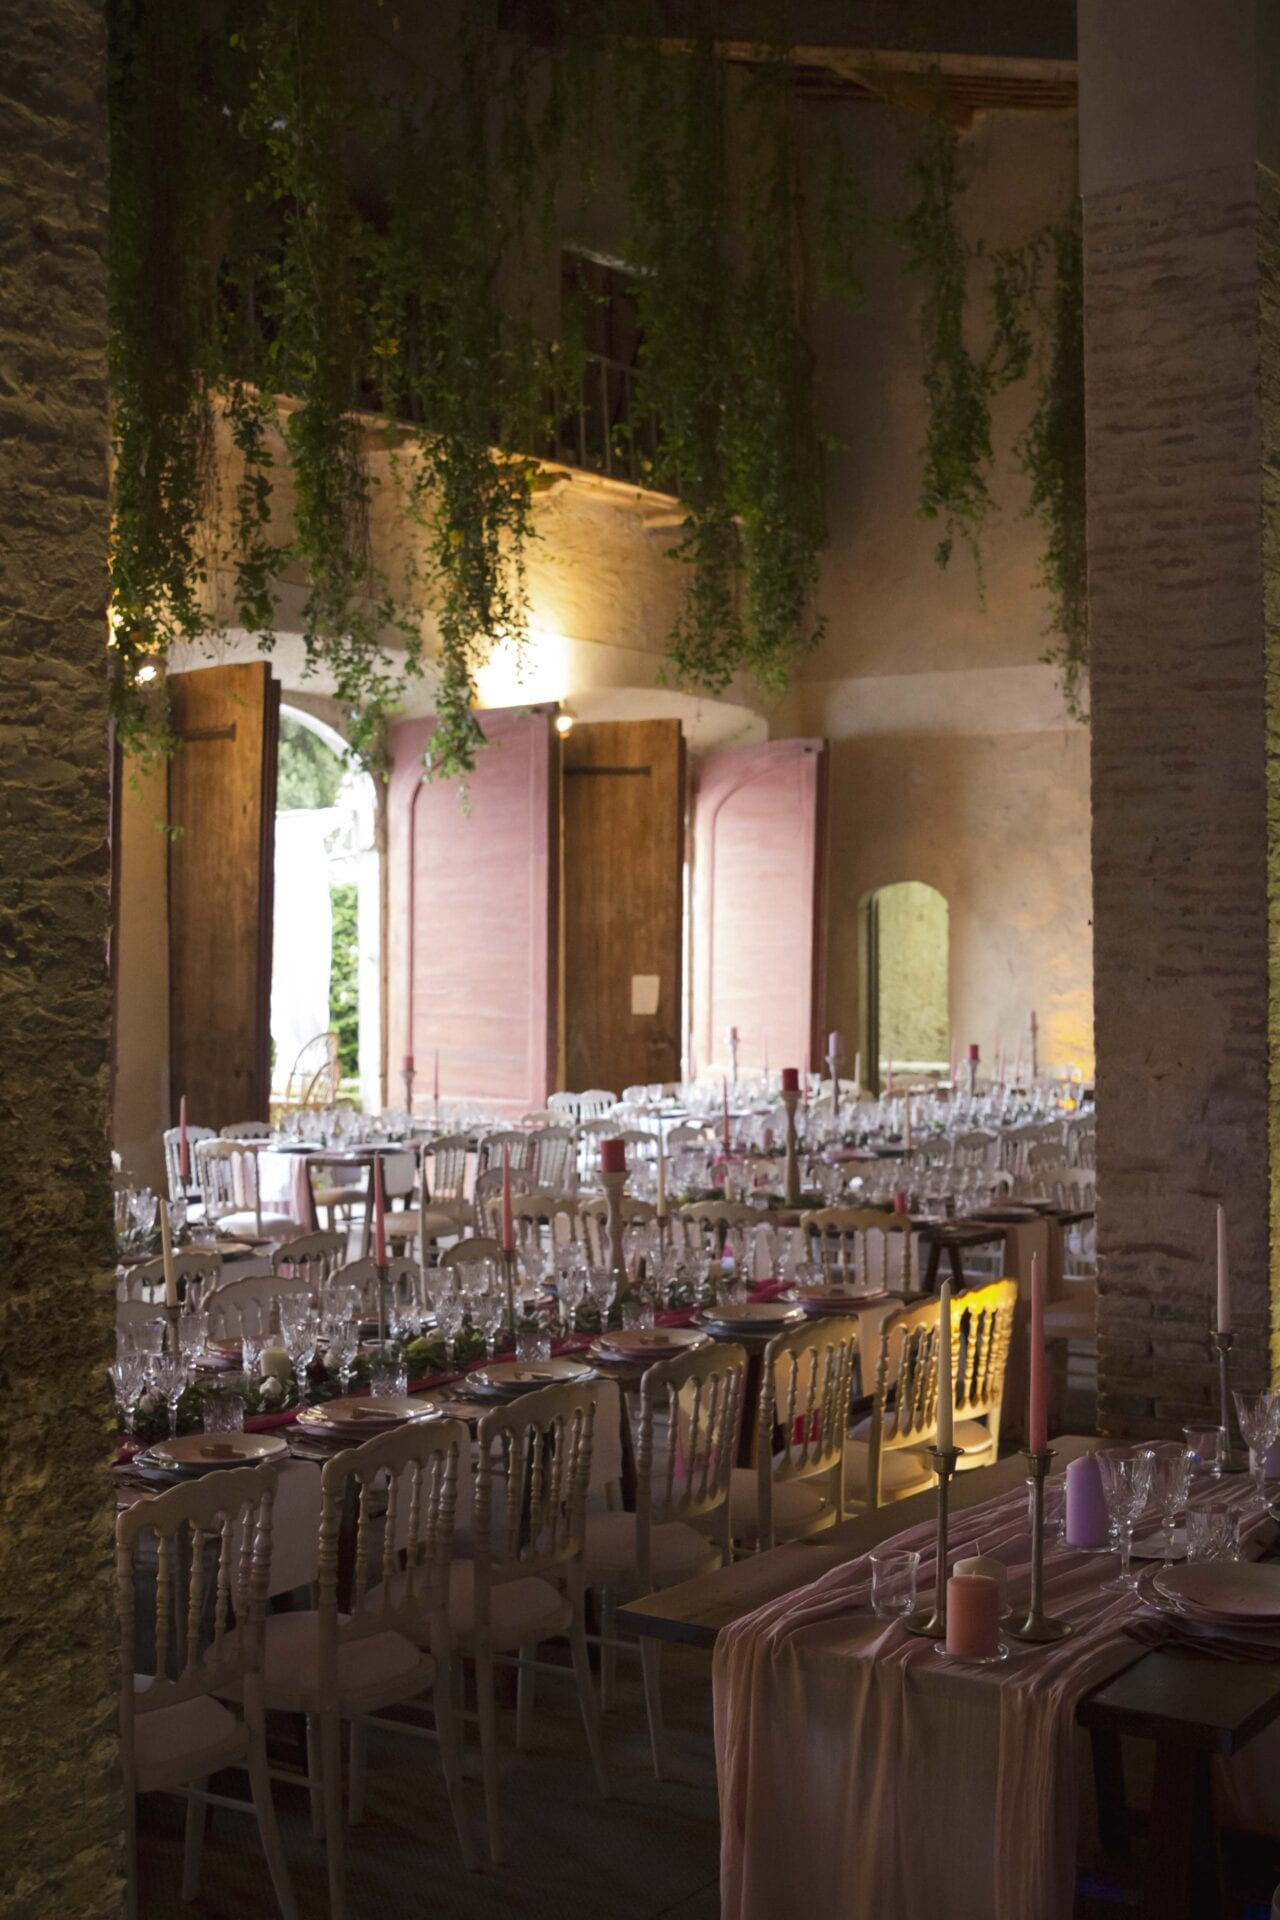 La Limonaia Villa Rospigliosi wedding at villa grabau lucca | weweddings wedding planning